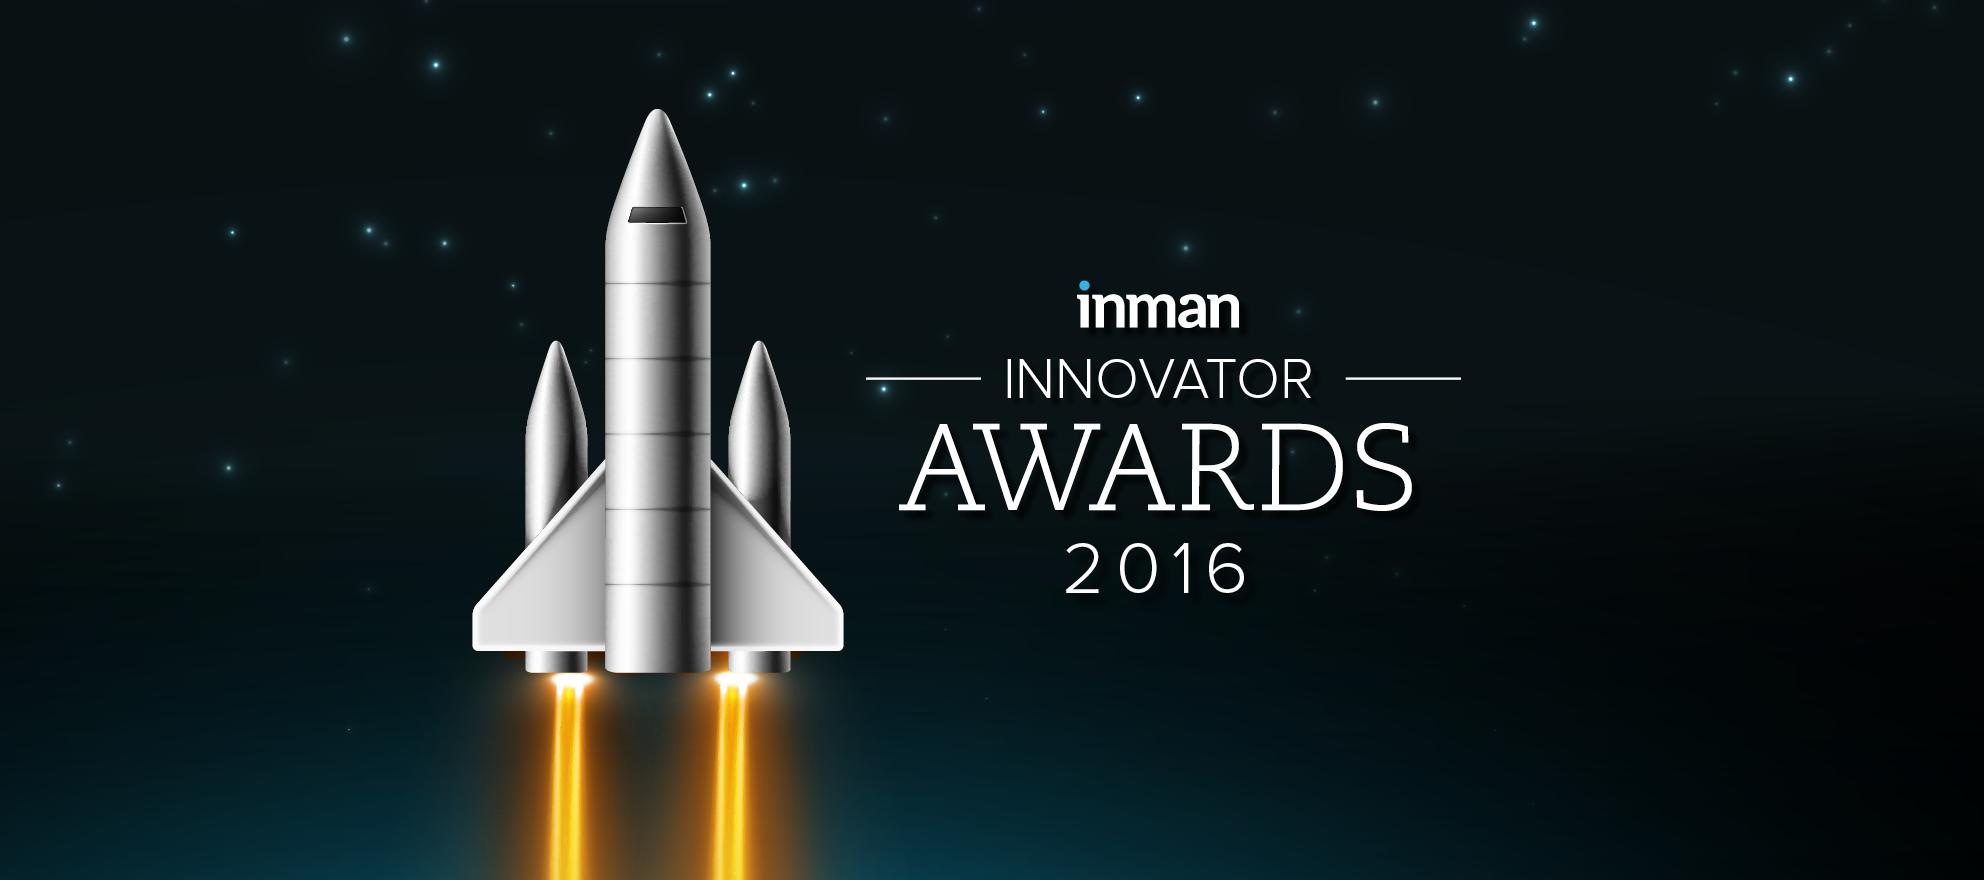 Inman announces 2016 Innovator Award winners